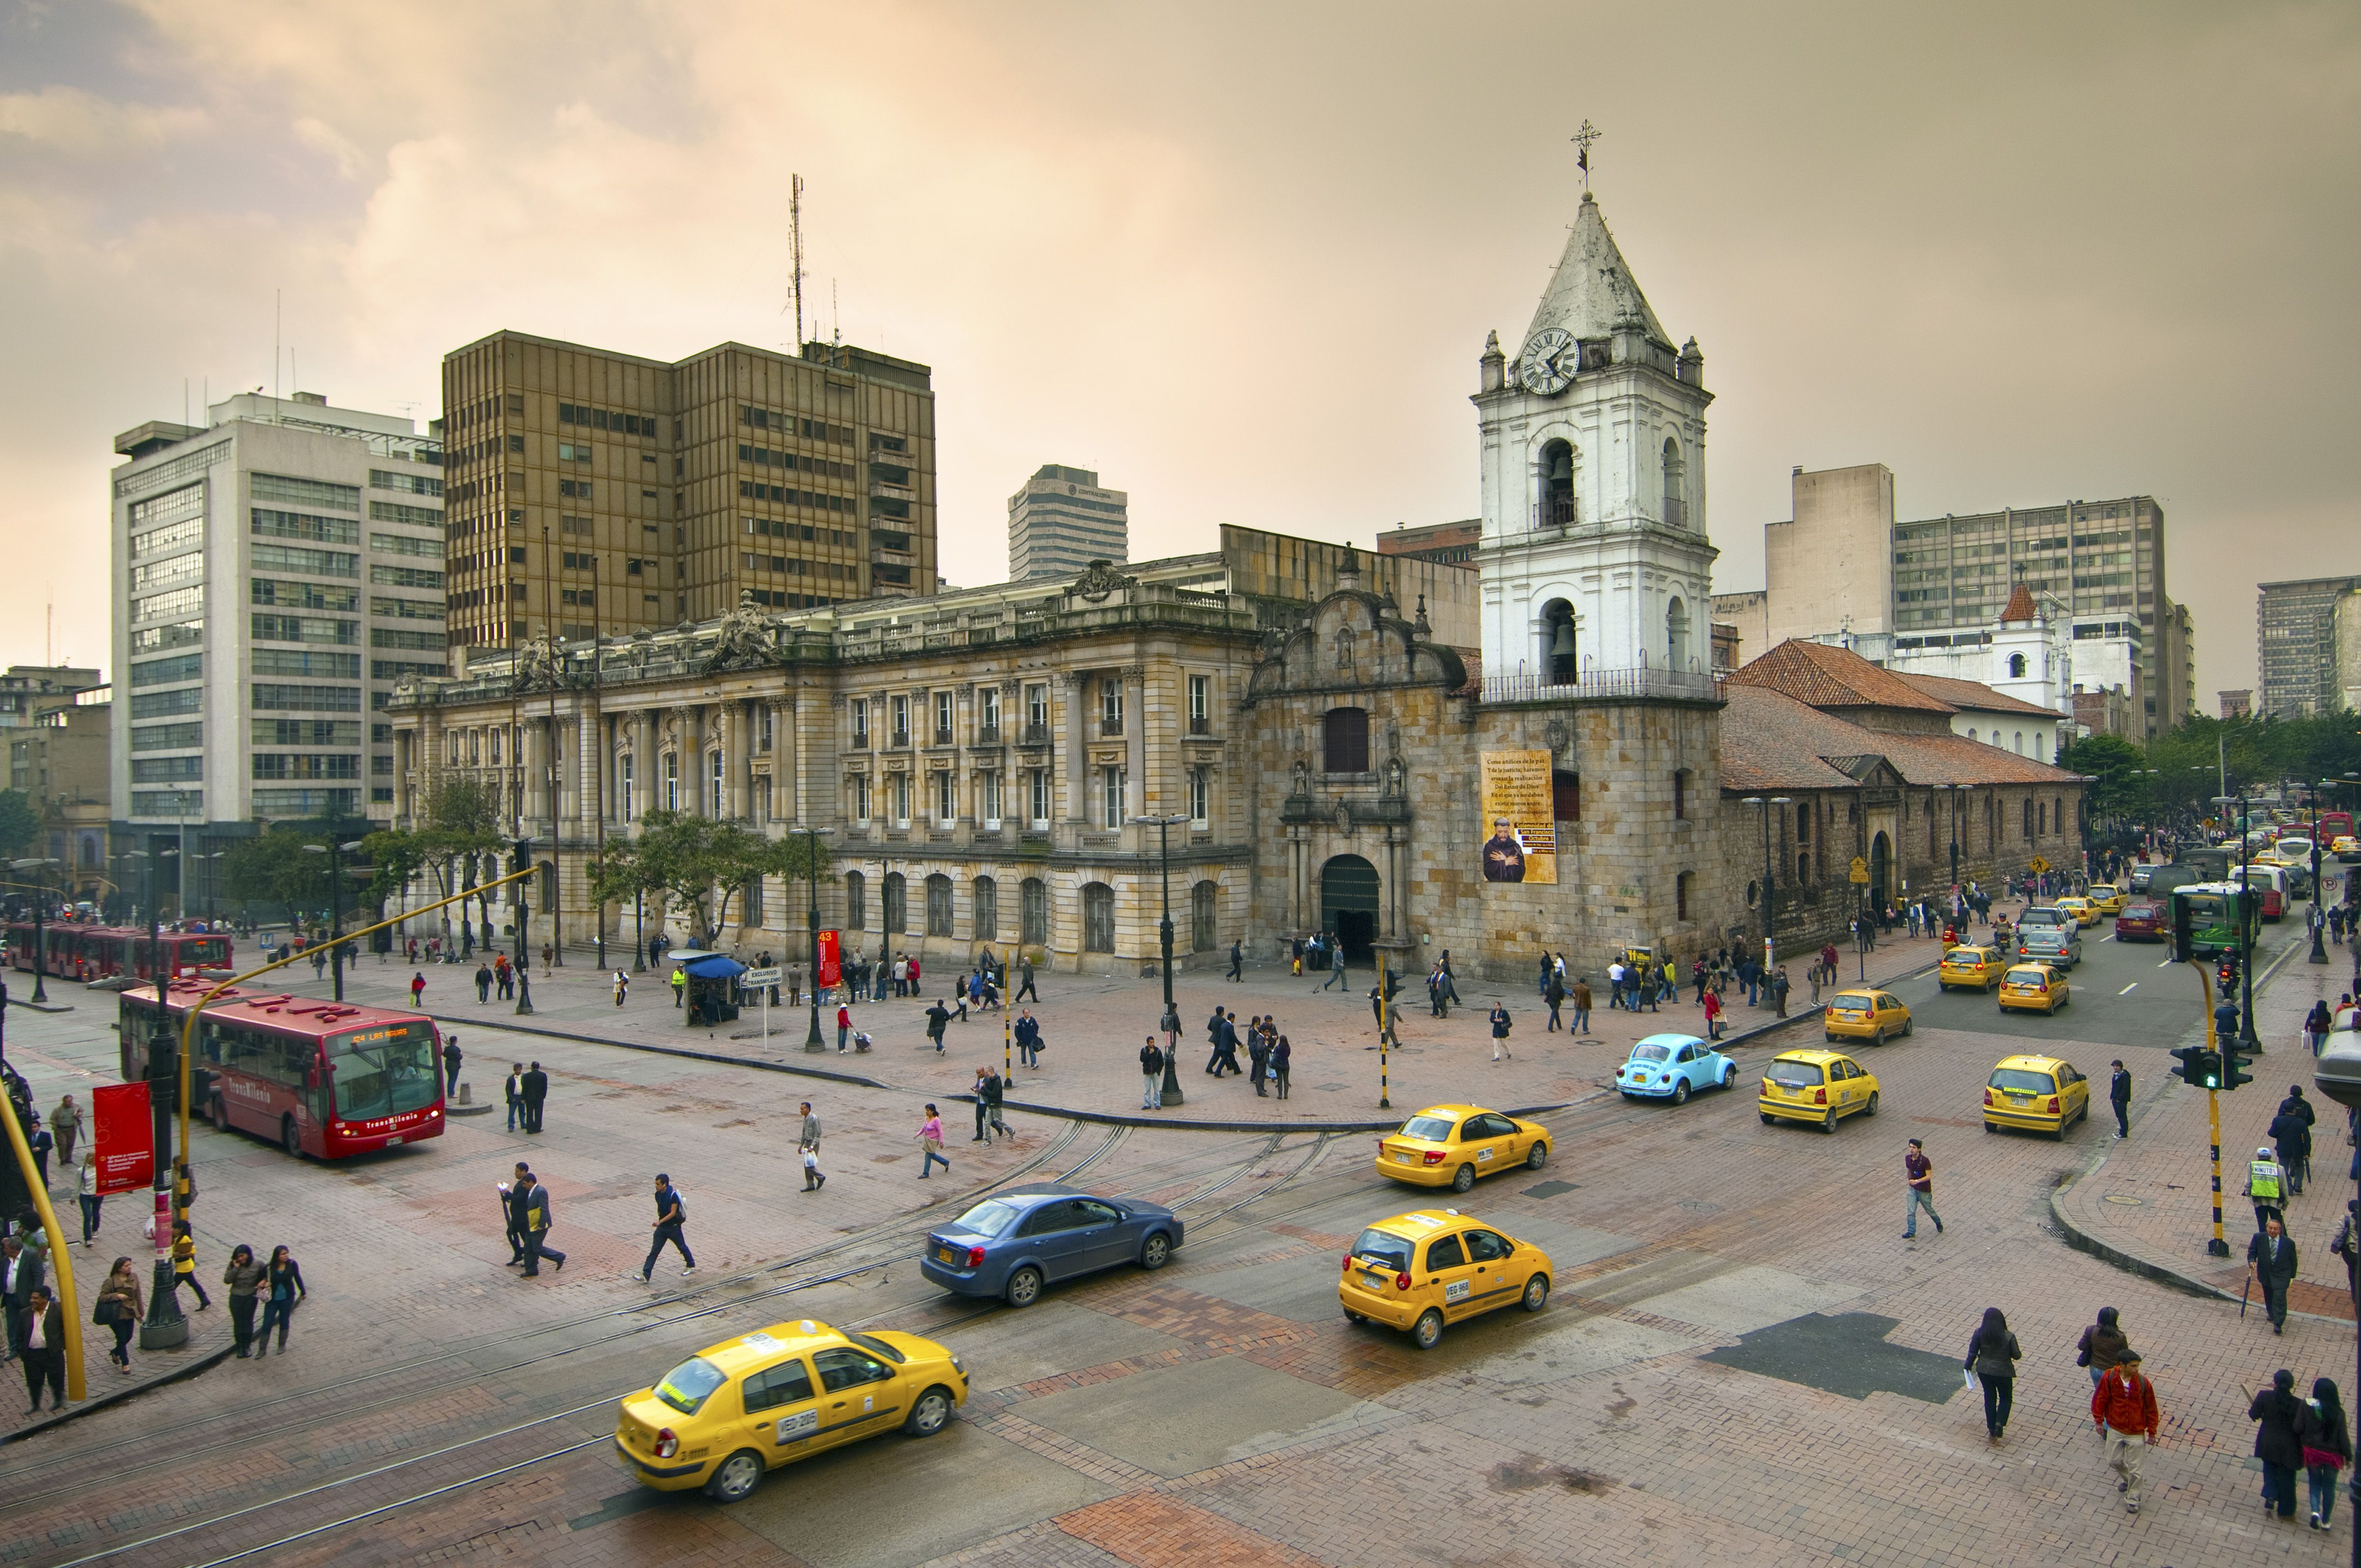 Colombia, Bogota, 16th century Iglesia de San Francisco, Bogota's Oldest Restored Church, Intersections of Avendia Jimenez and Carrera Septima